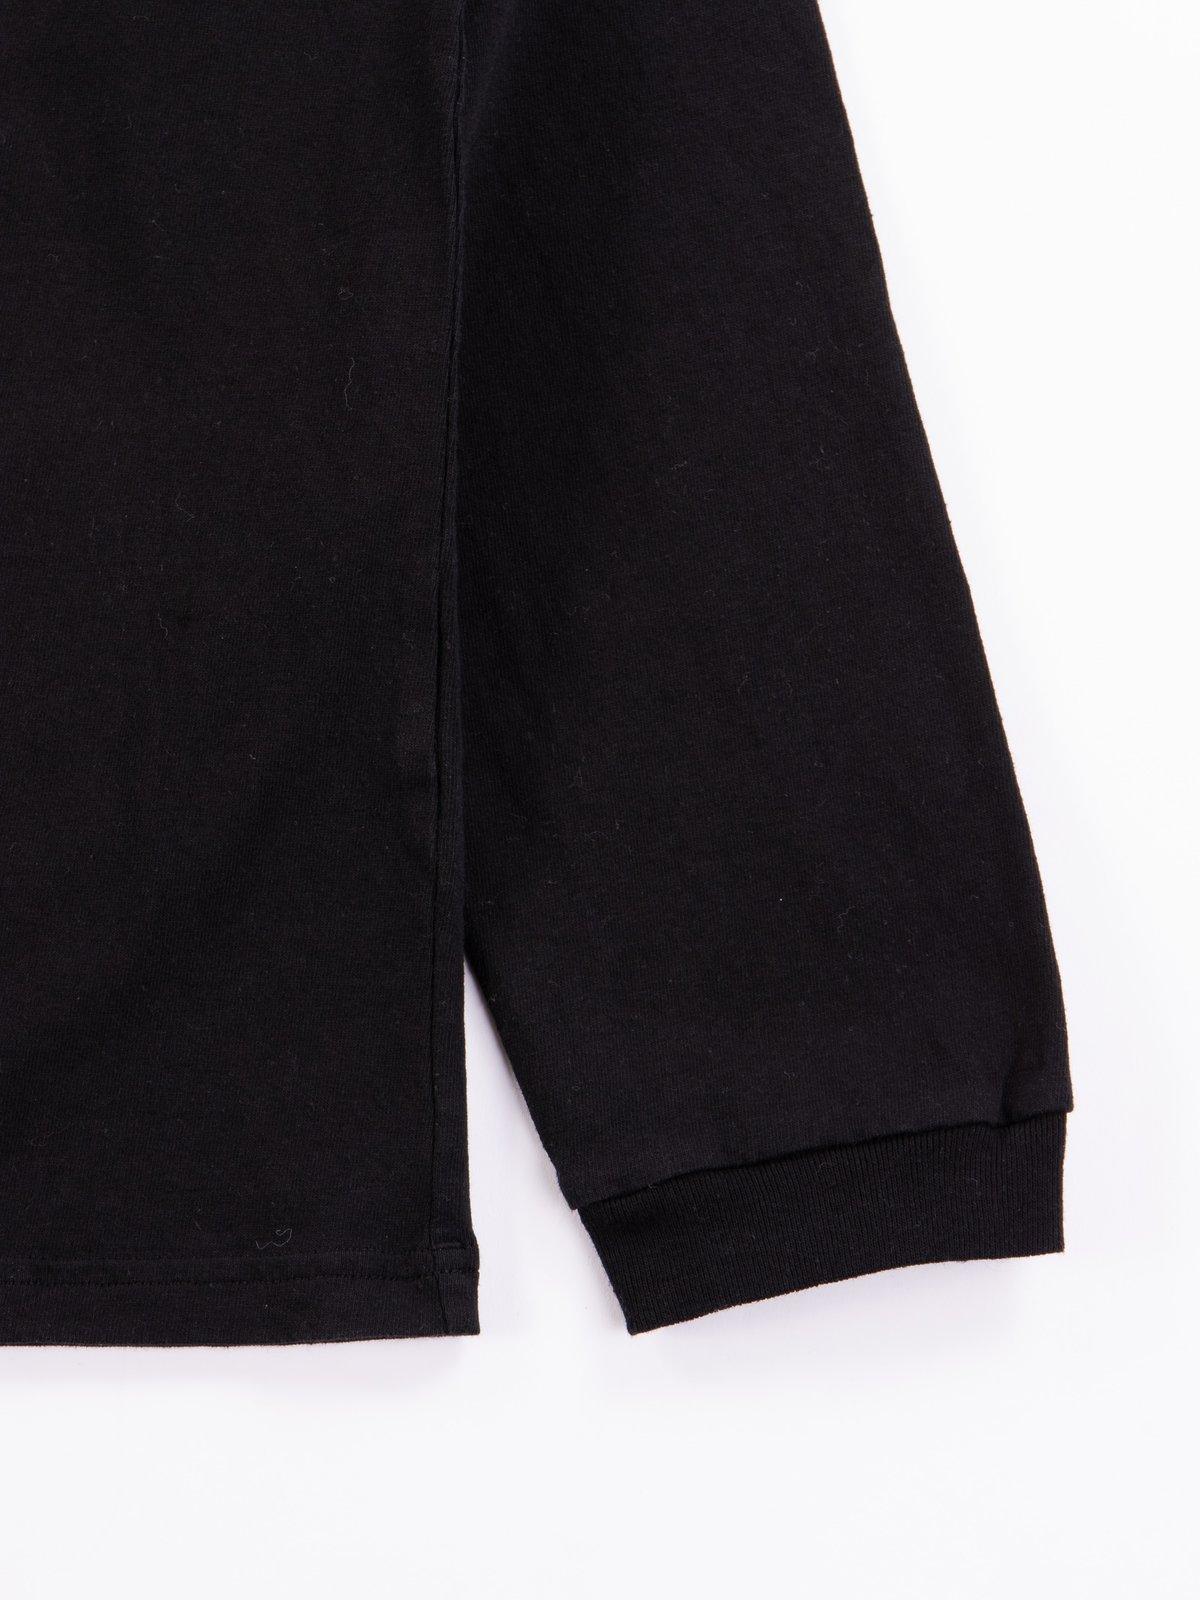 Black Long Sleeve Pocket T–Shirt - Image 4